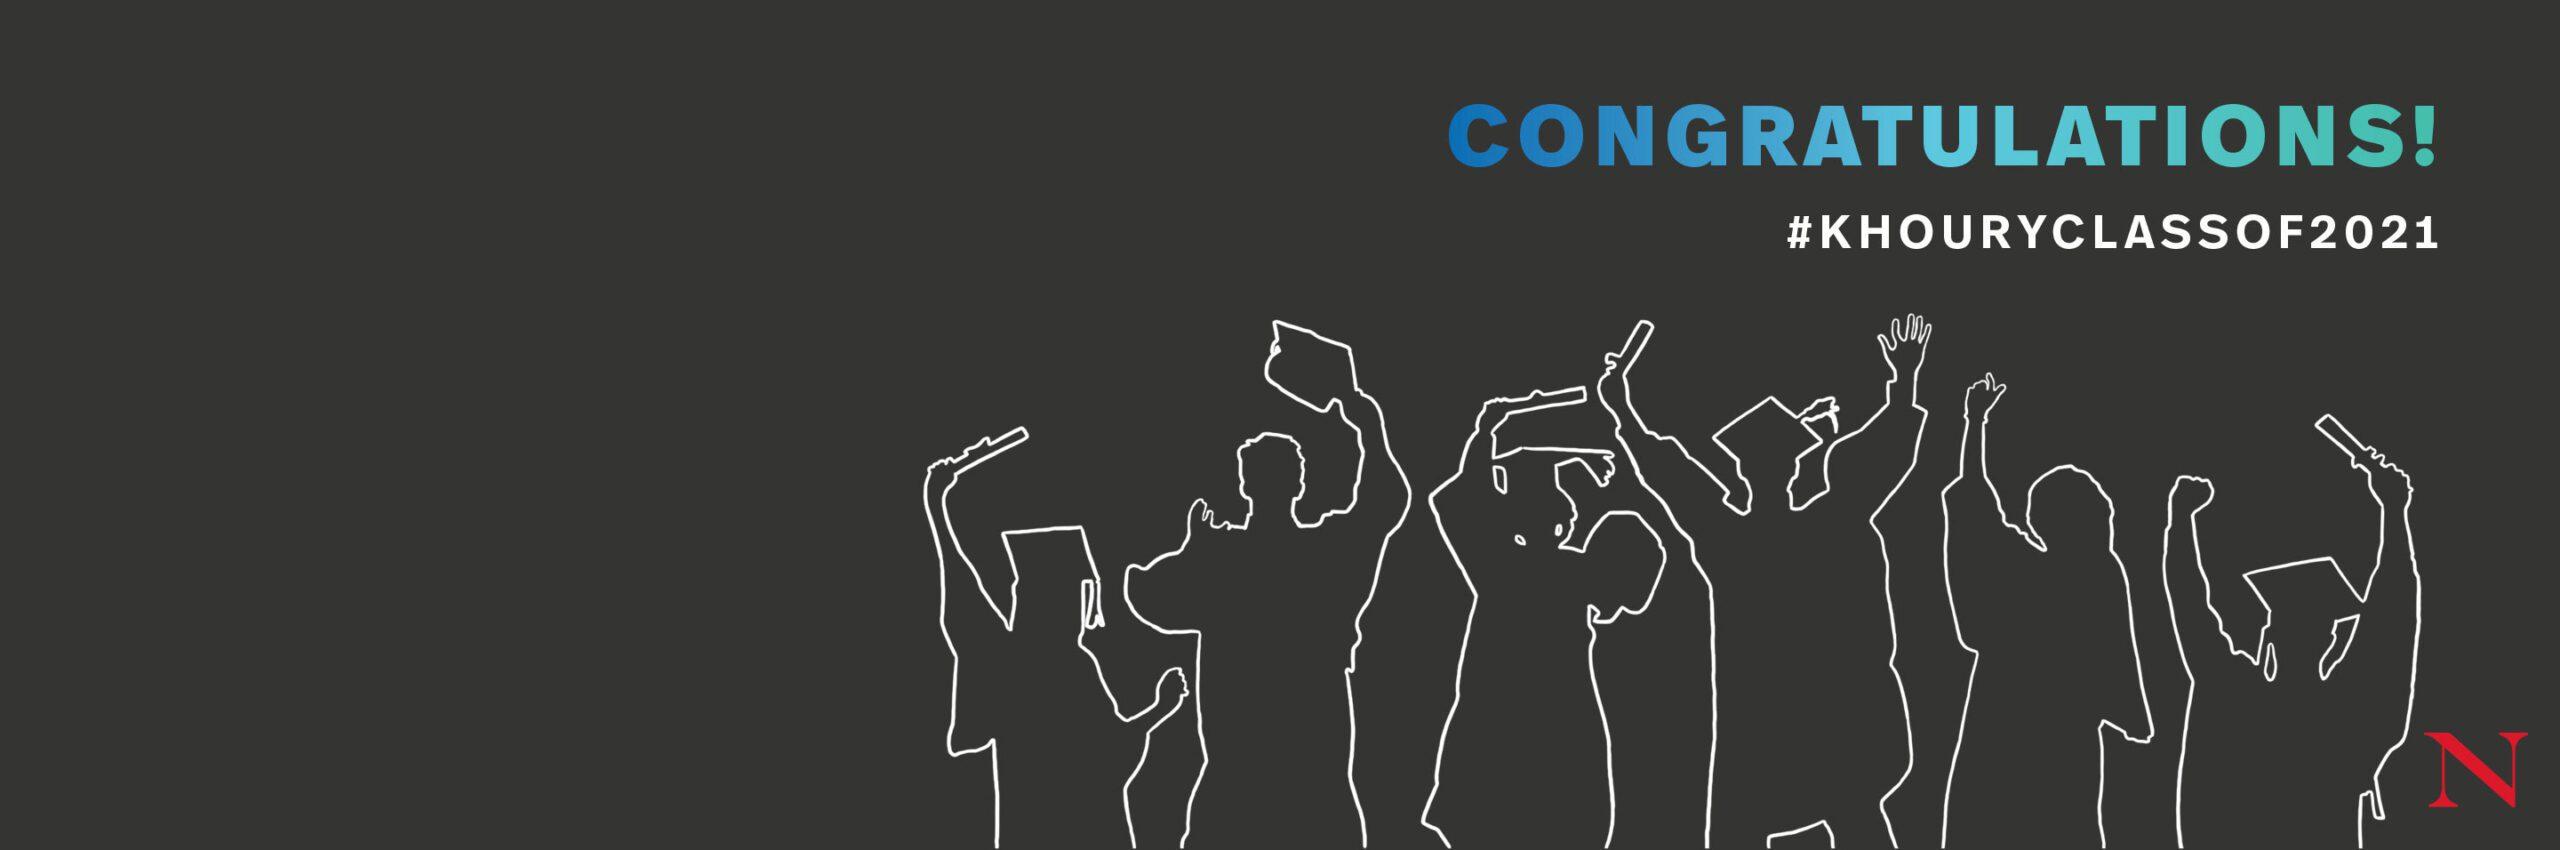 Congratulations Khoury Class of 2021